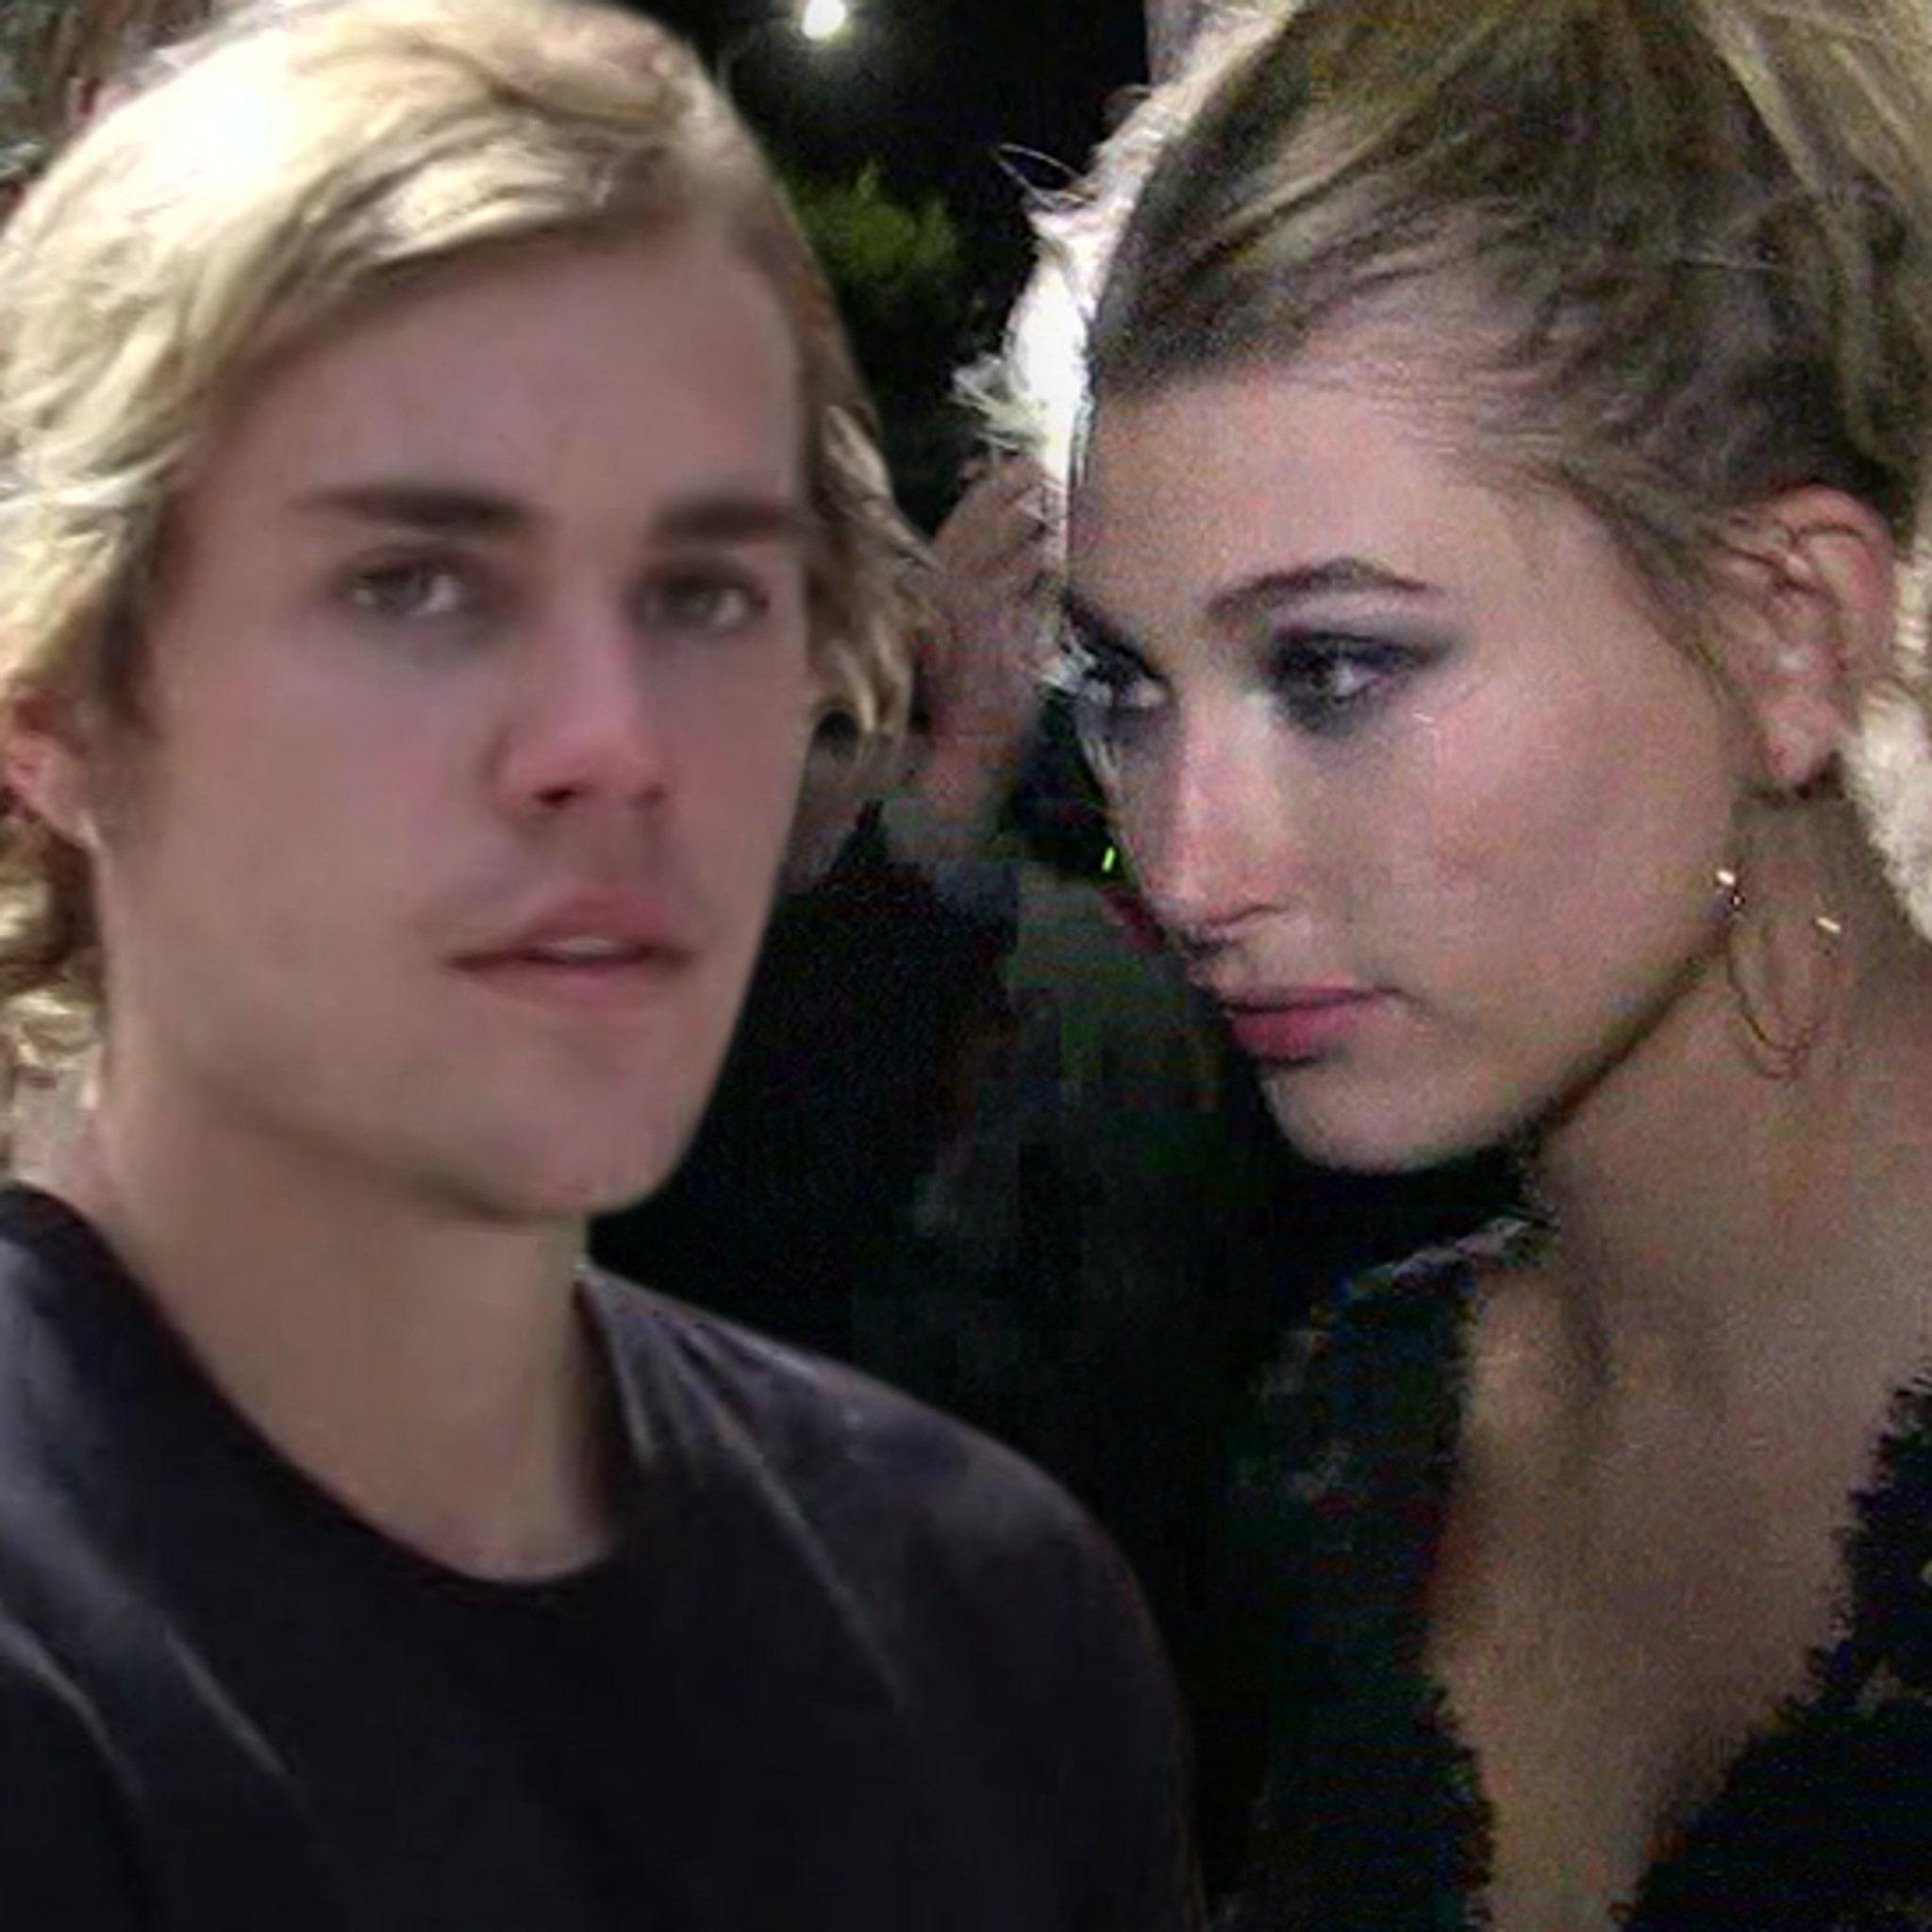 Justin & Hailey Bieber Postpone Wedding Ceremony, Again